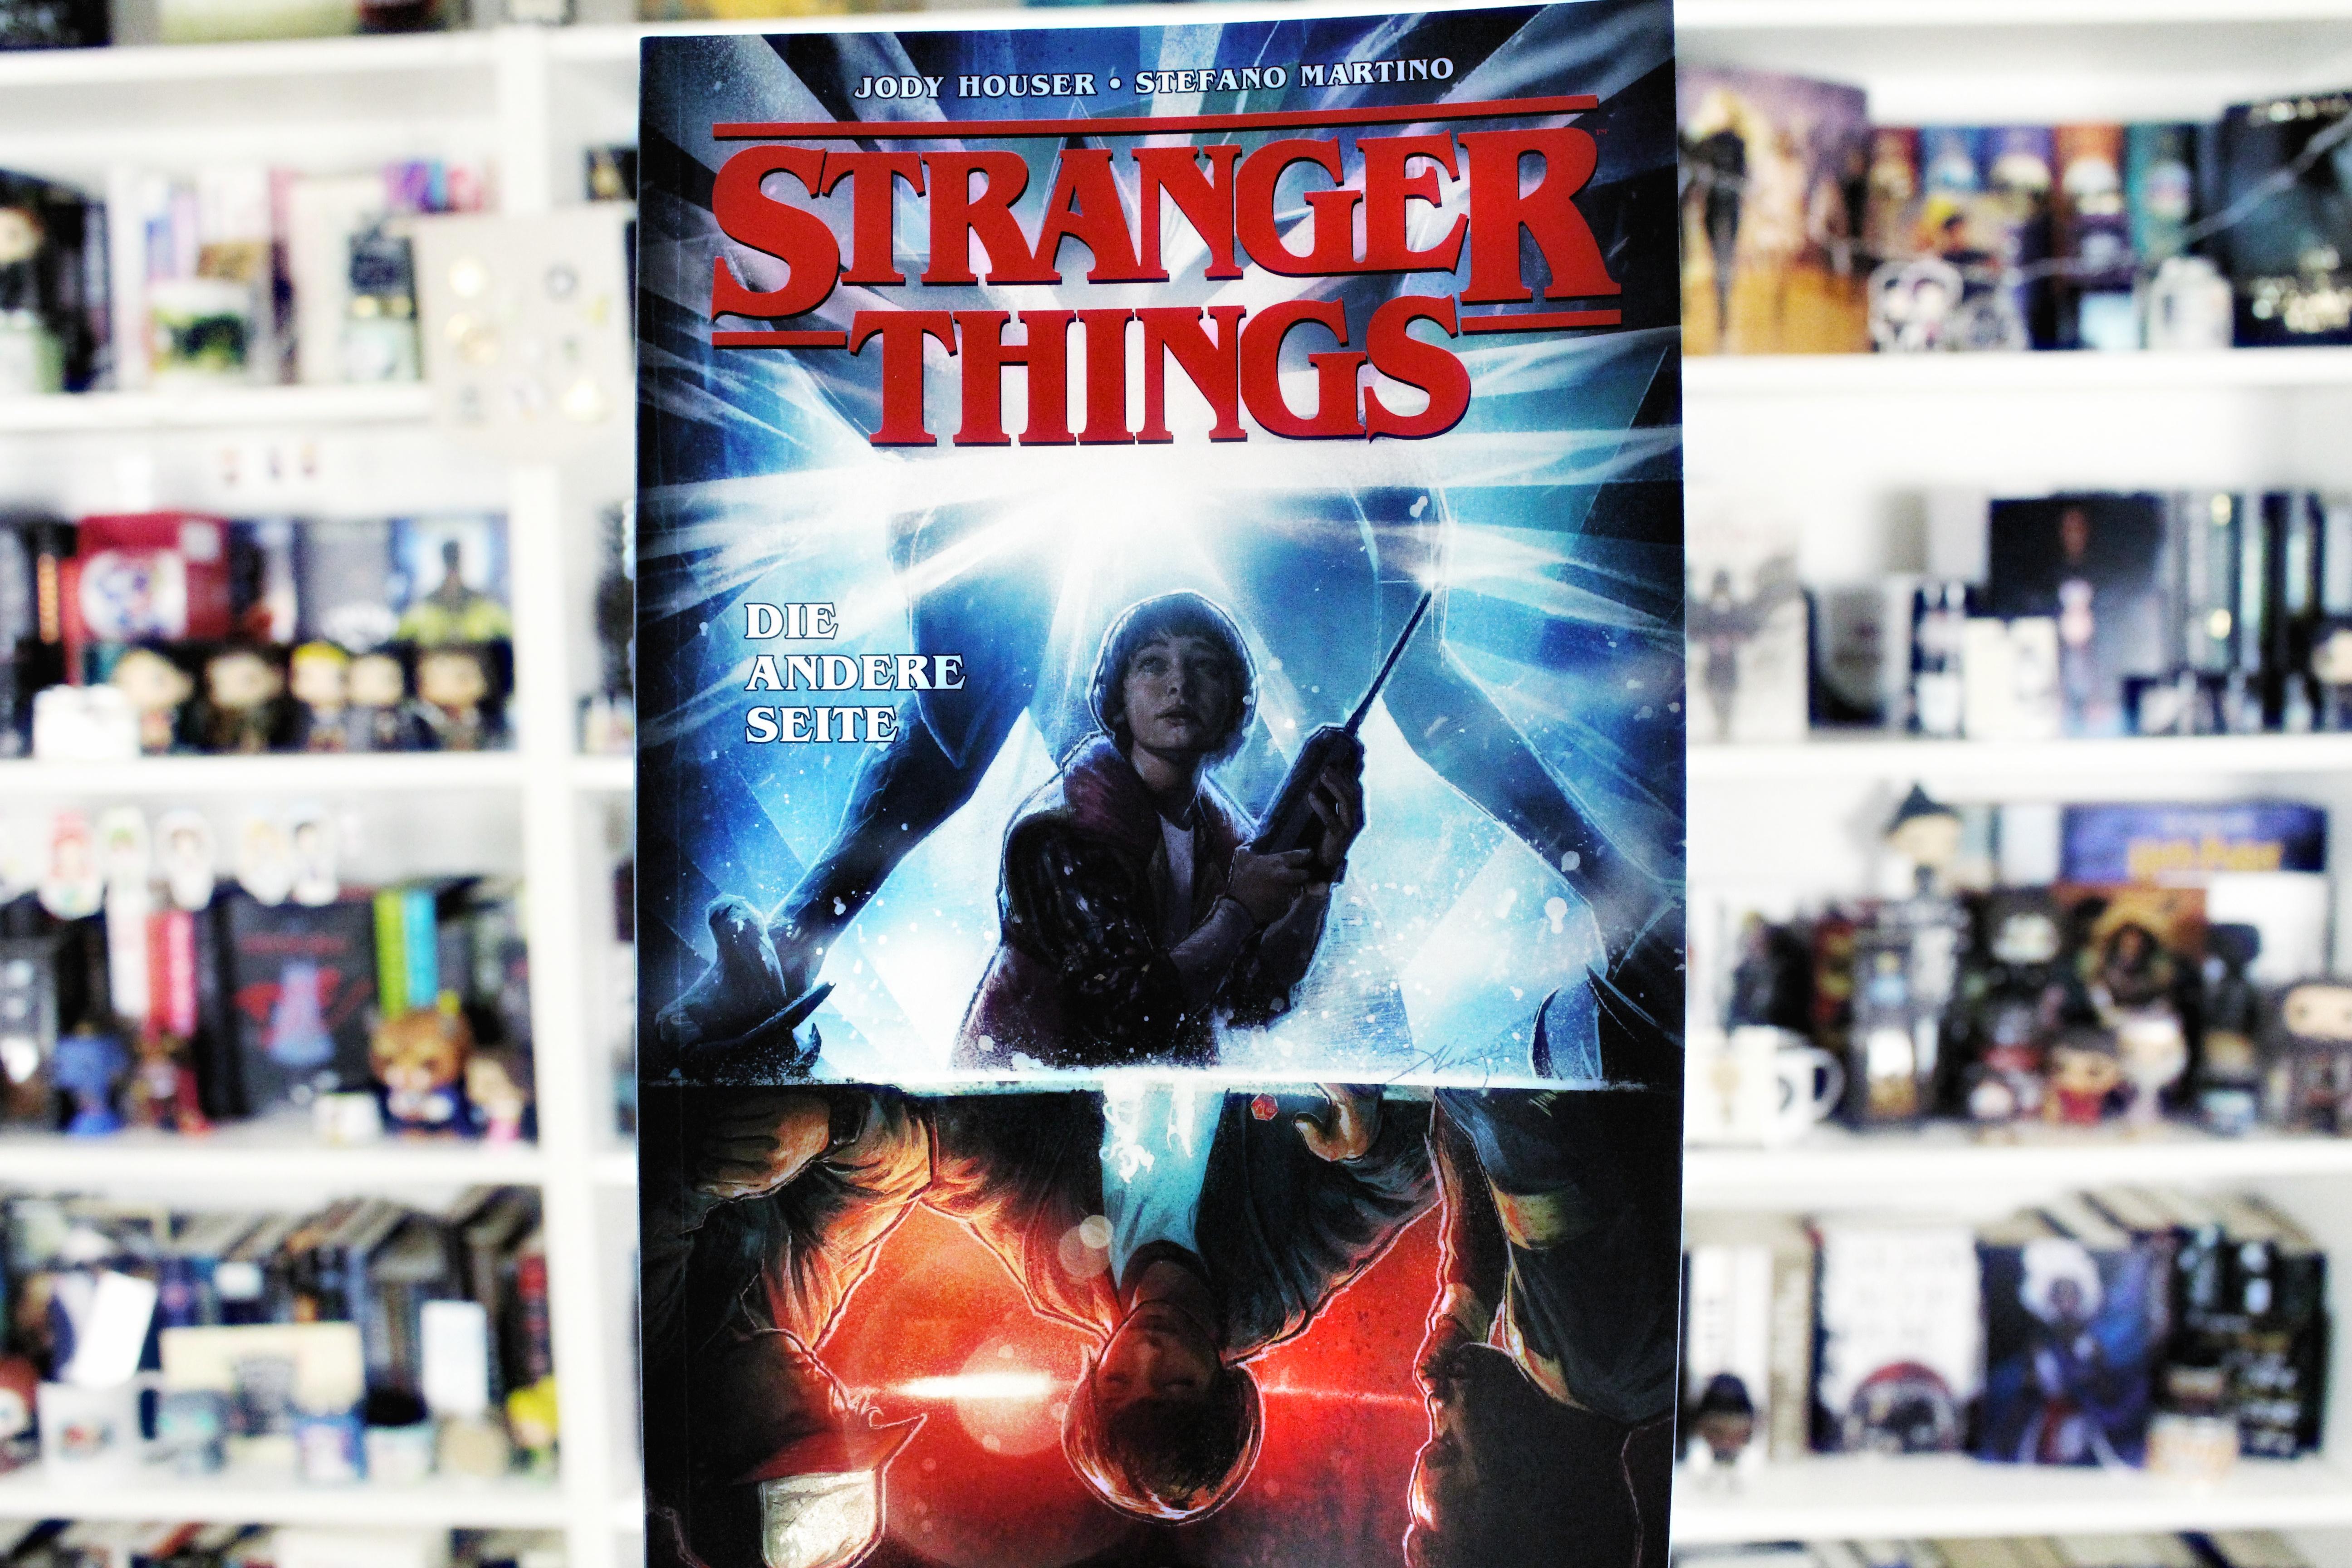 Rezension | Stranger Things 1 von Jody Houser & Stefano Martino